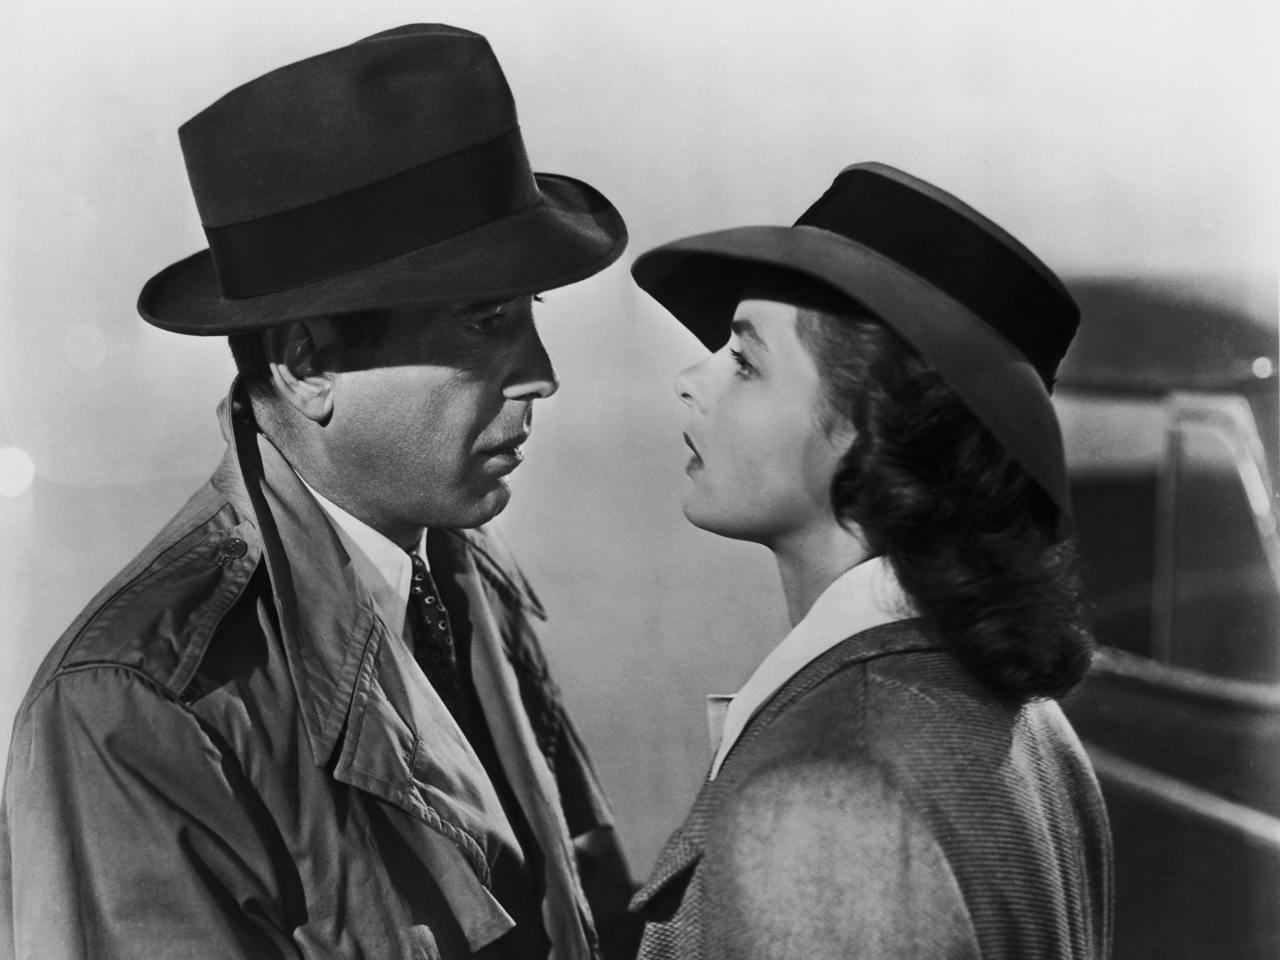 Humphrey Bogart and Ingrid Bergman talking in Casablanca